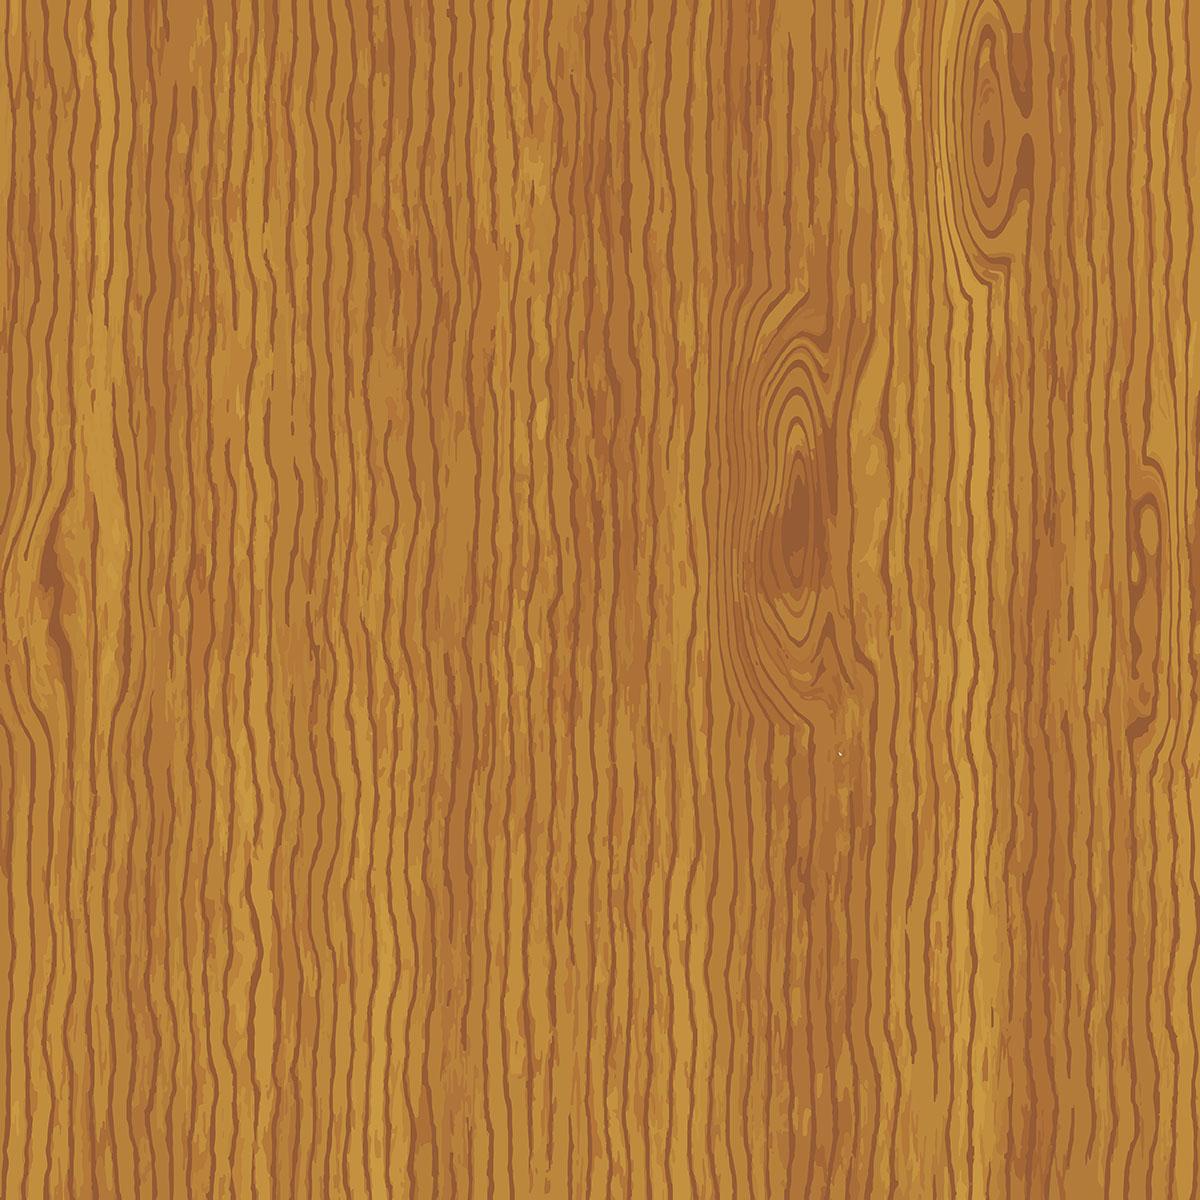 Wood Texture Background Download Free Vectors Clipart Graphics Amp Vector Art